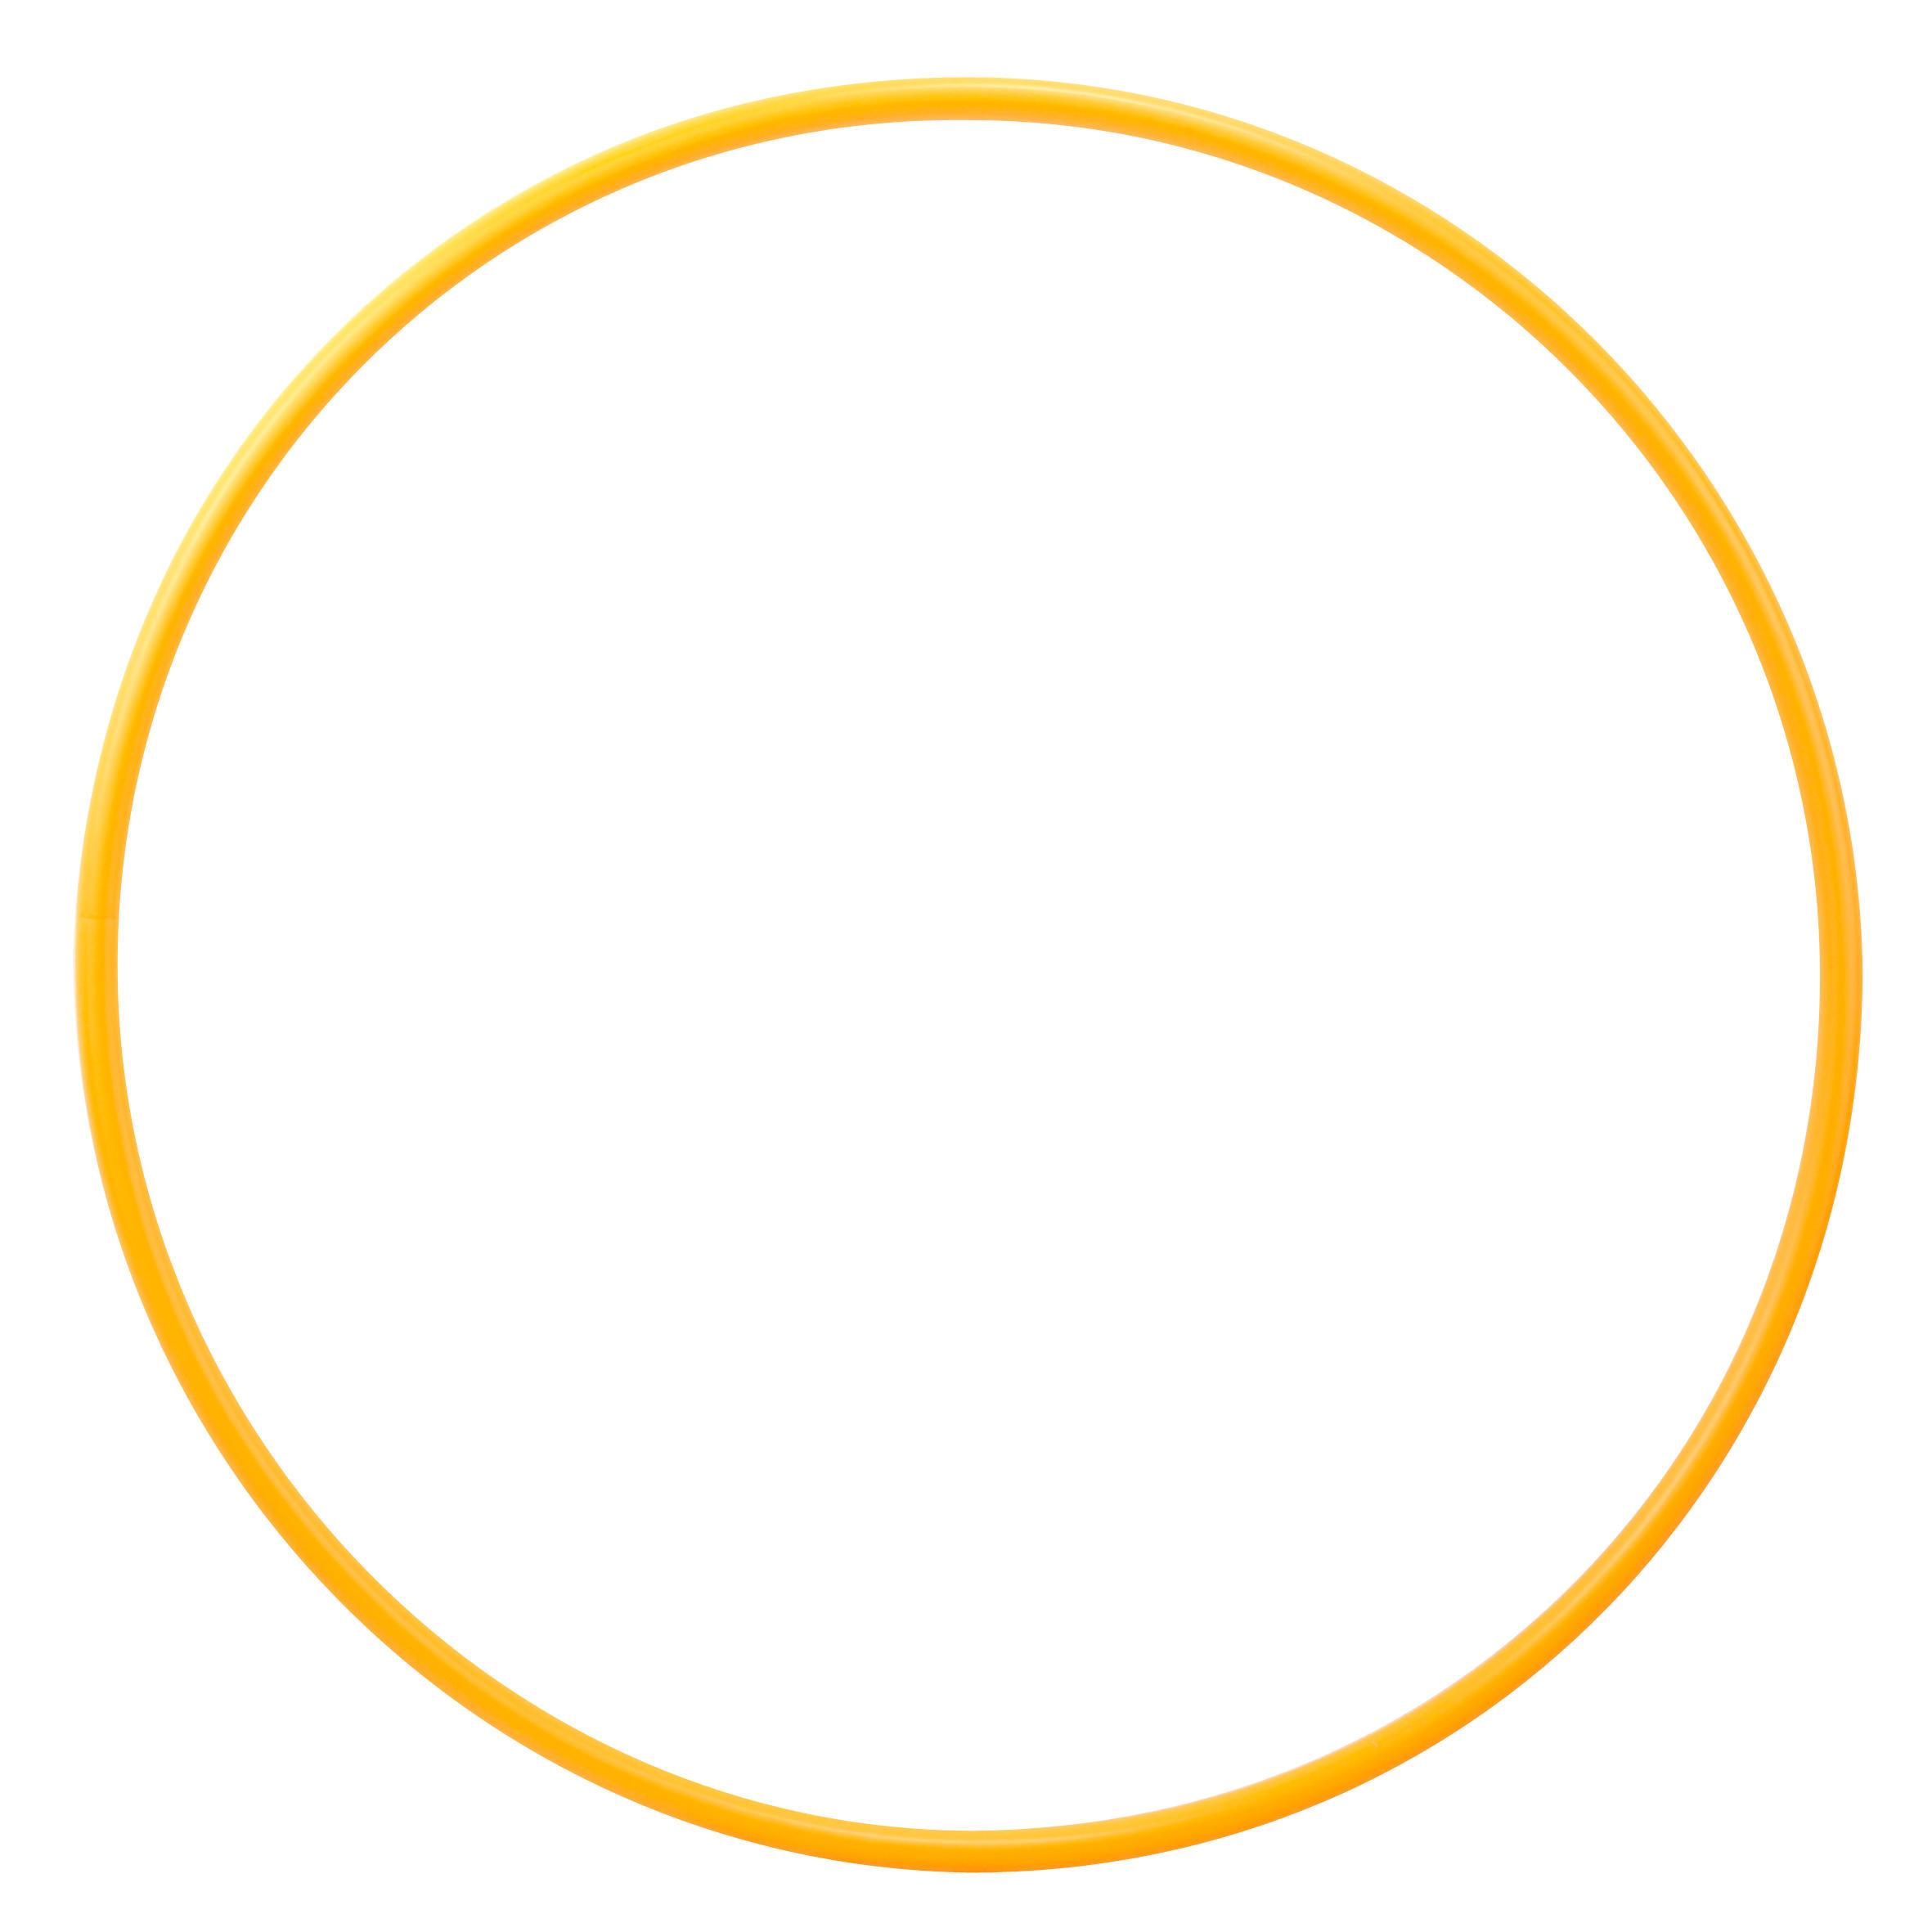 Cerceau de Gymnastique Rythmique (GR) de 75 cm Orange